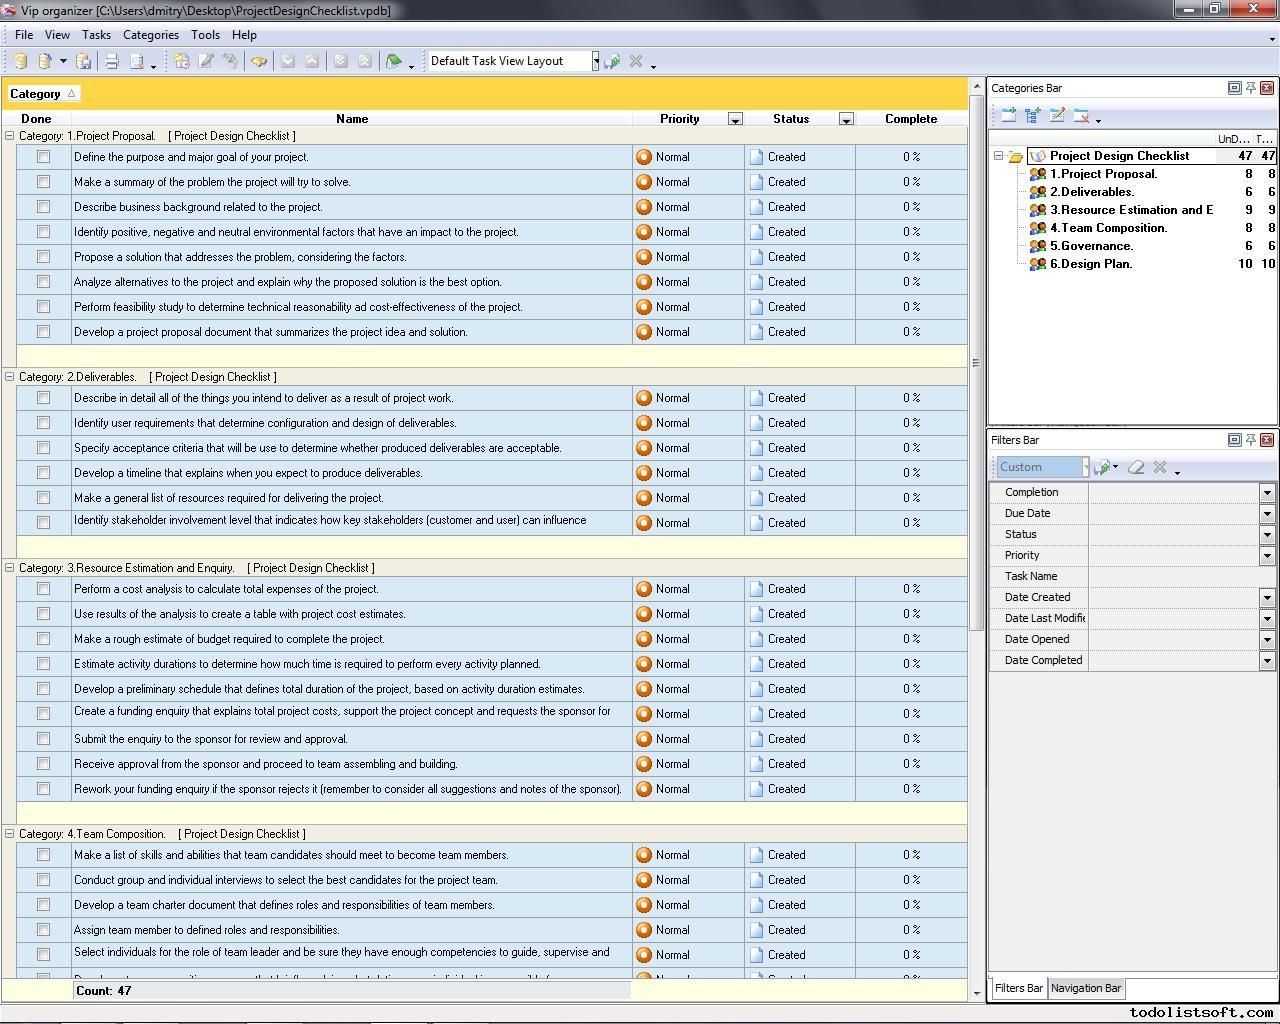 10 Design Deliverables Checklist Template Images